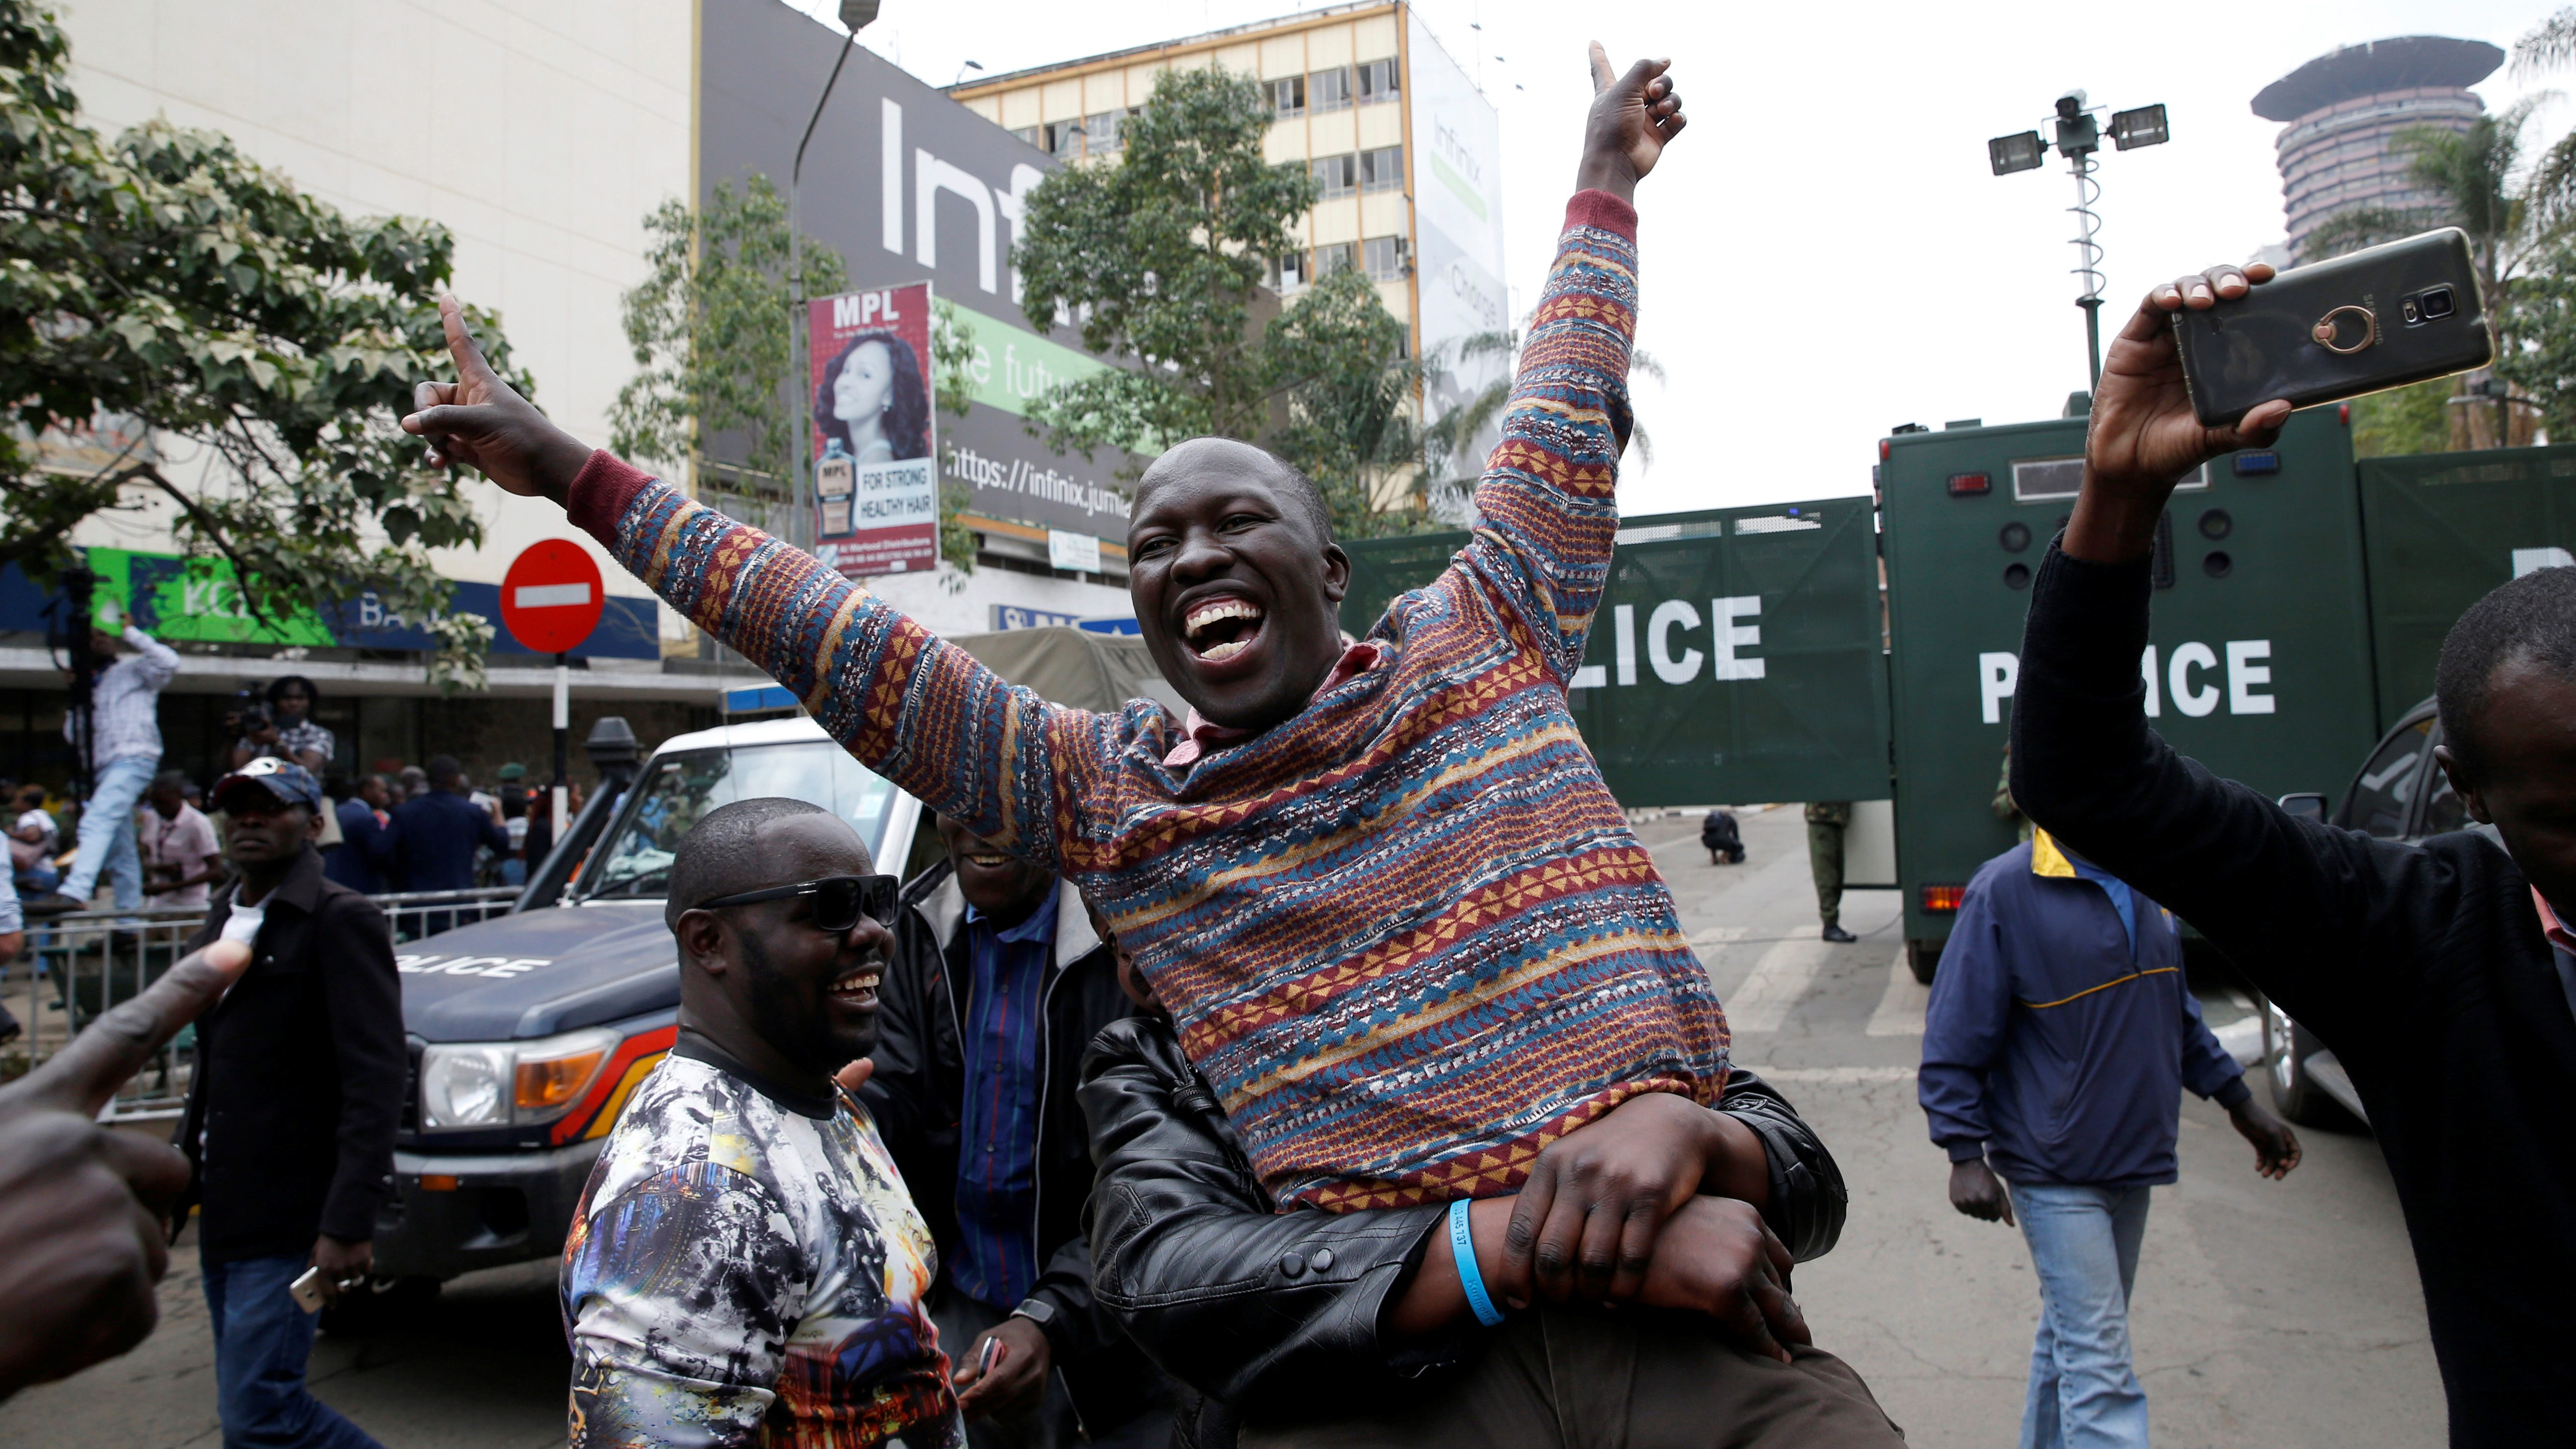 Supporters of an opposition leader Raila Odinga cheer outside the court after President Uhuru Kenyatta's election win was declared invalid in Nairobi, Kenya, September 1,